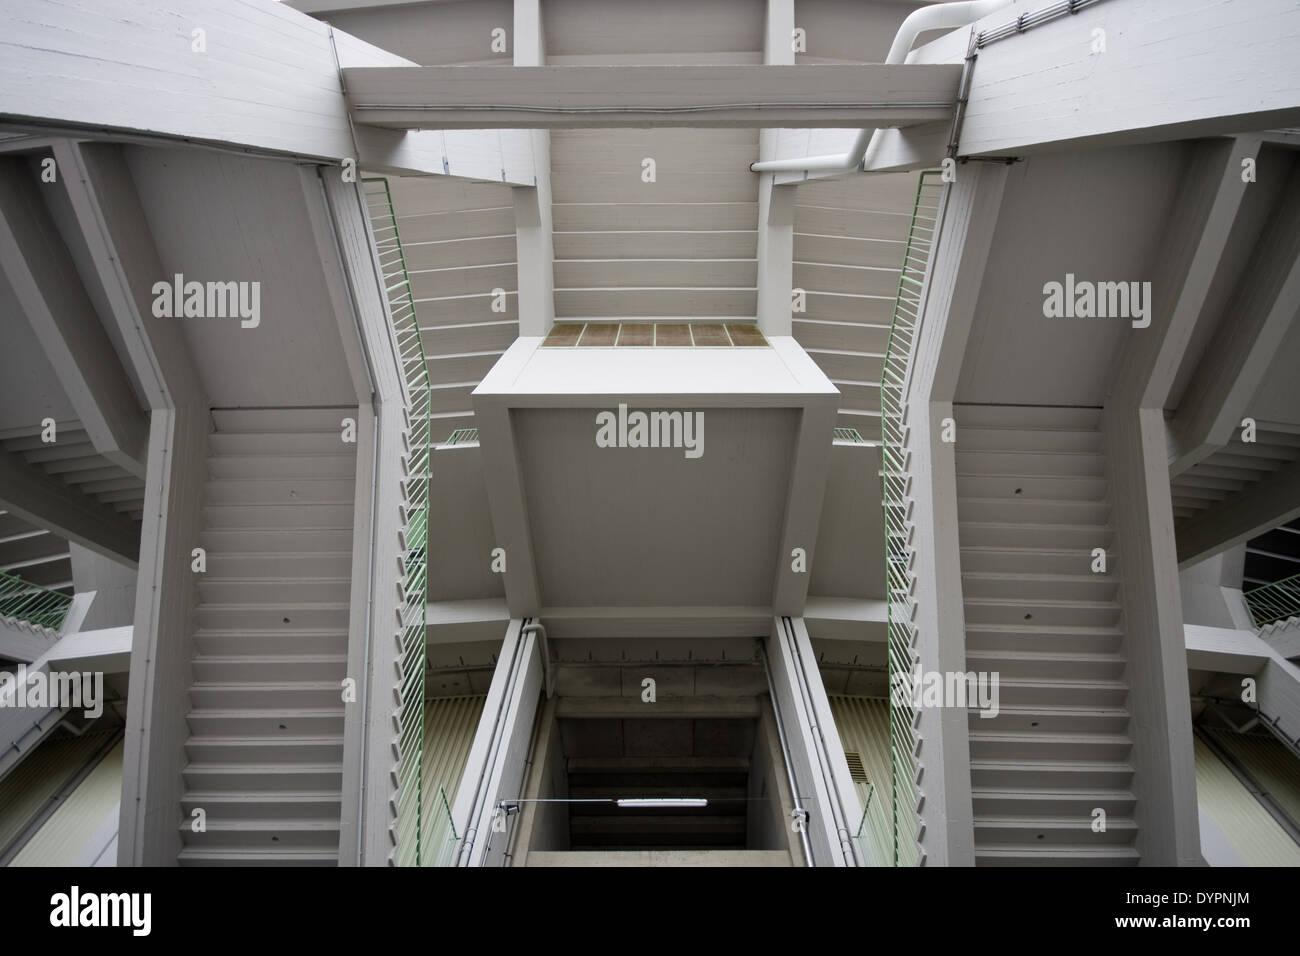 Stiegen, Stadion, stairs, stadium - Stock Image